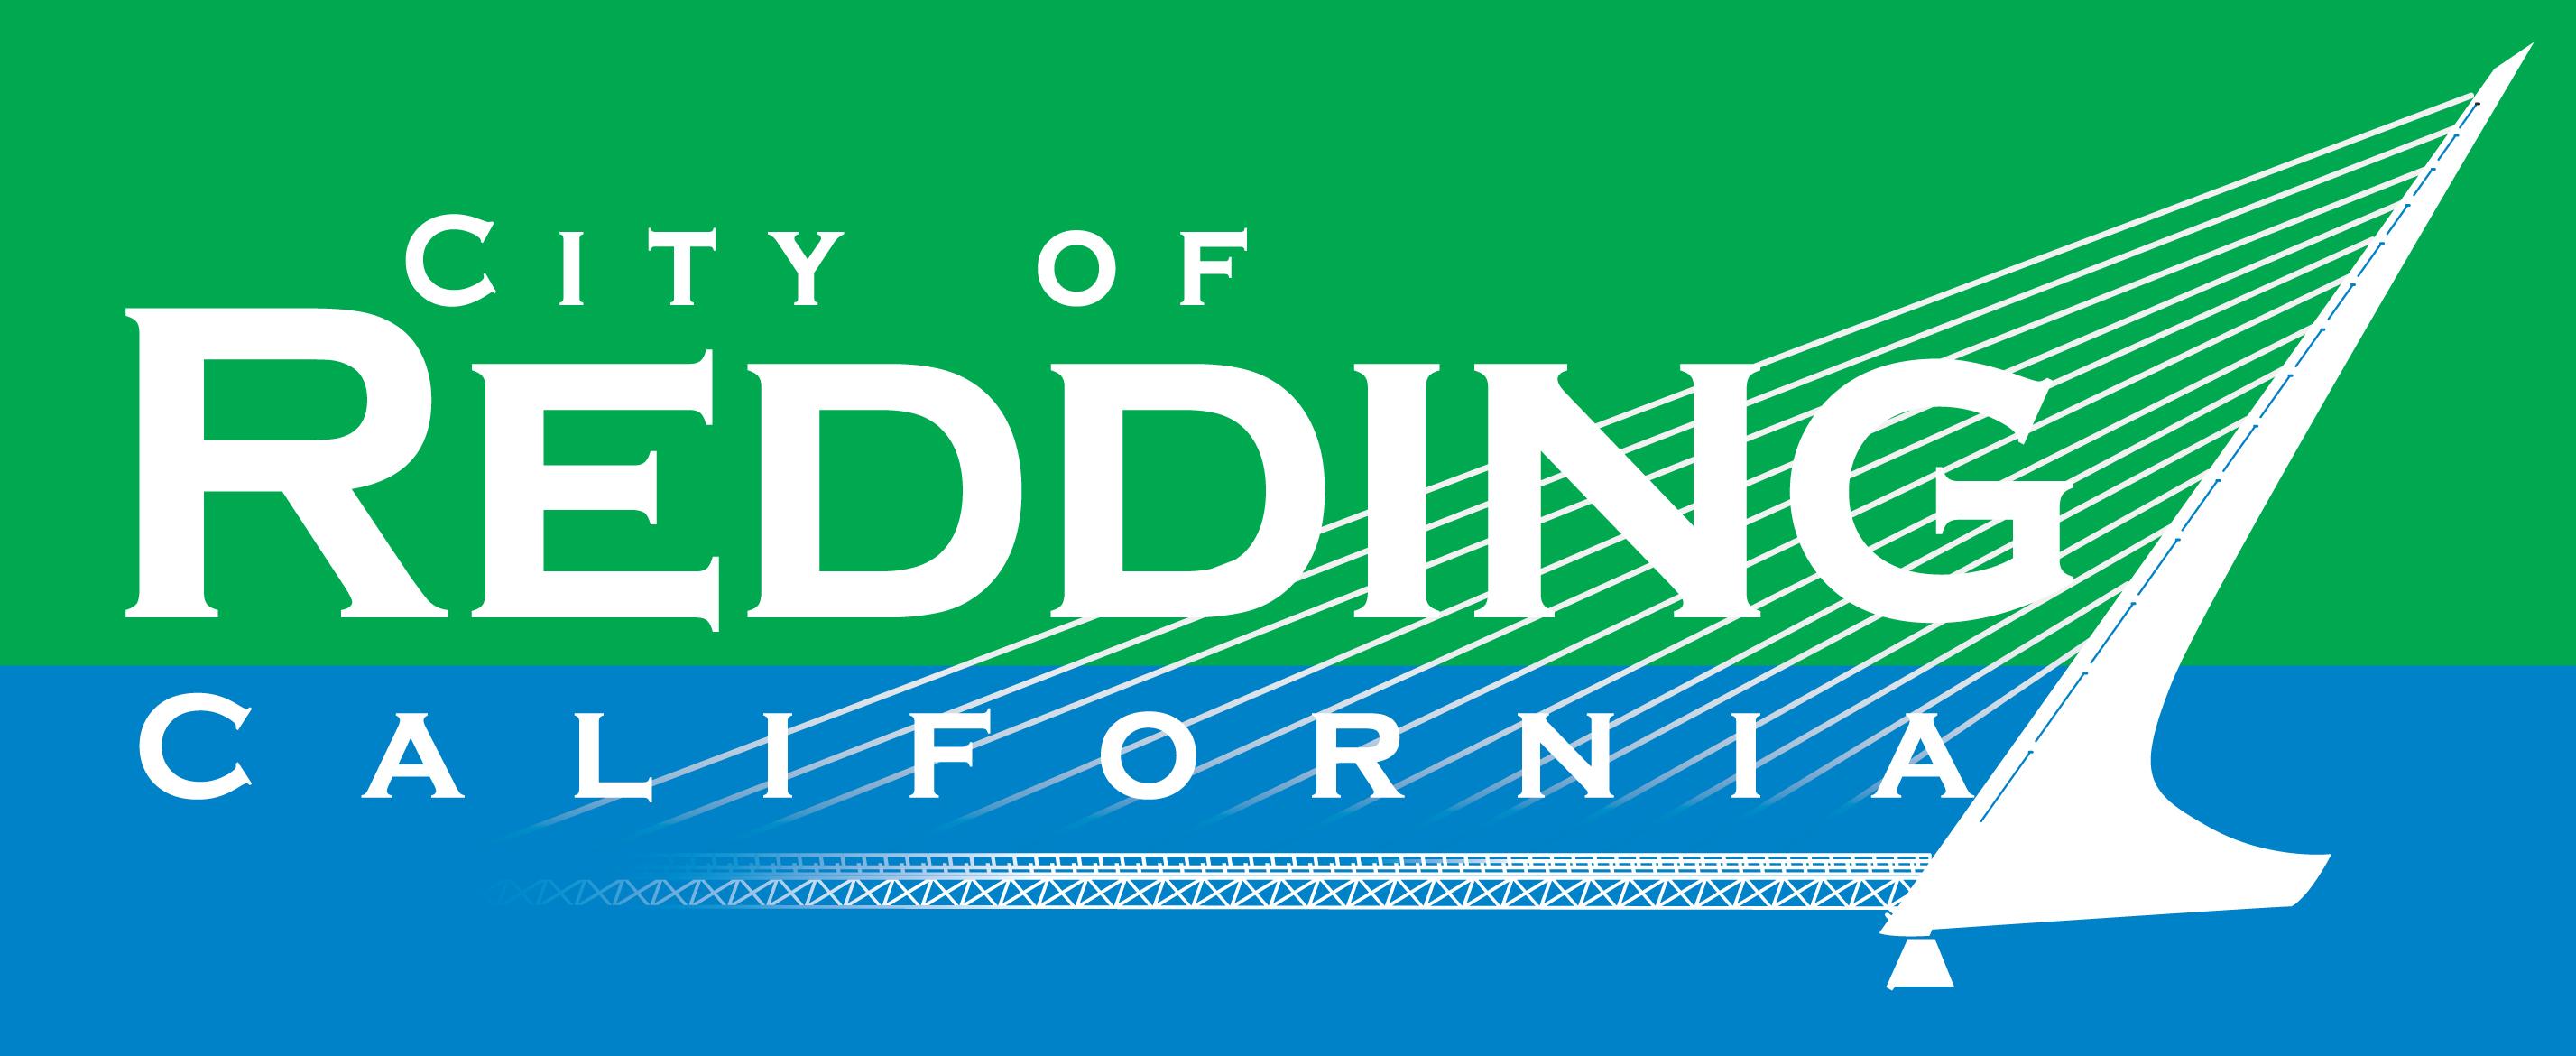 City of Redding logo